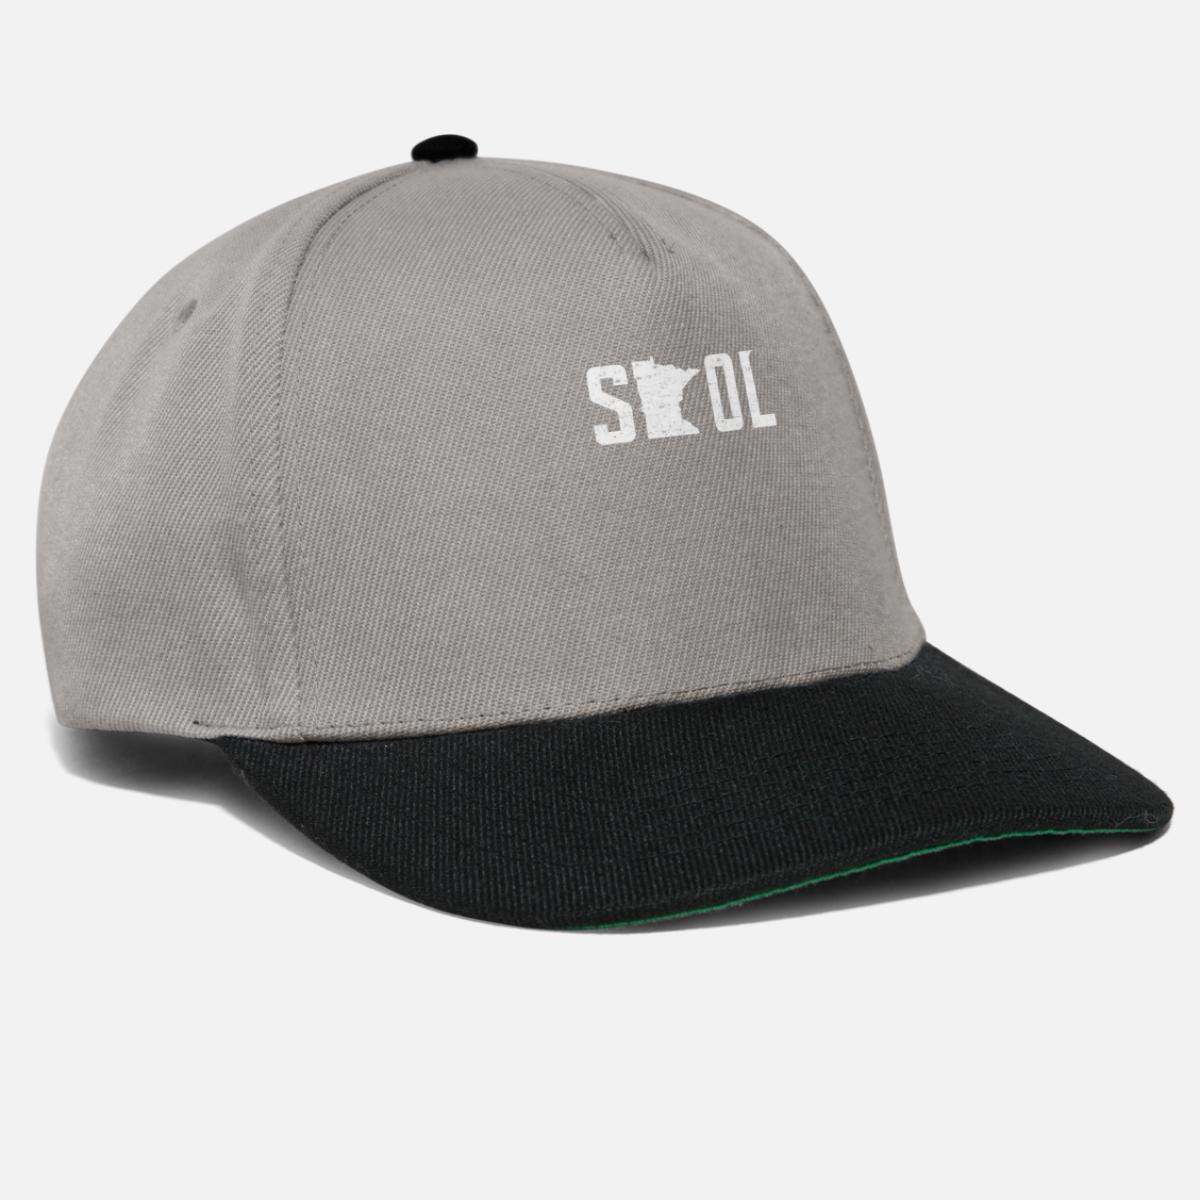 SKOL Helmet Hat Distressed Vintage Nordic Yellow Snapback Cap ... 00da7b16f454